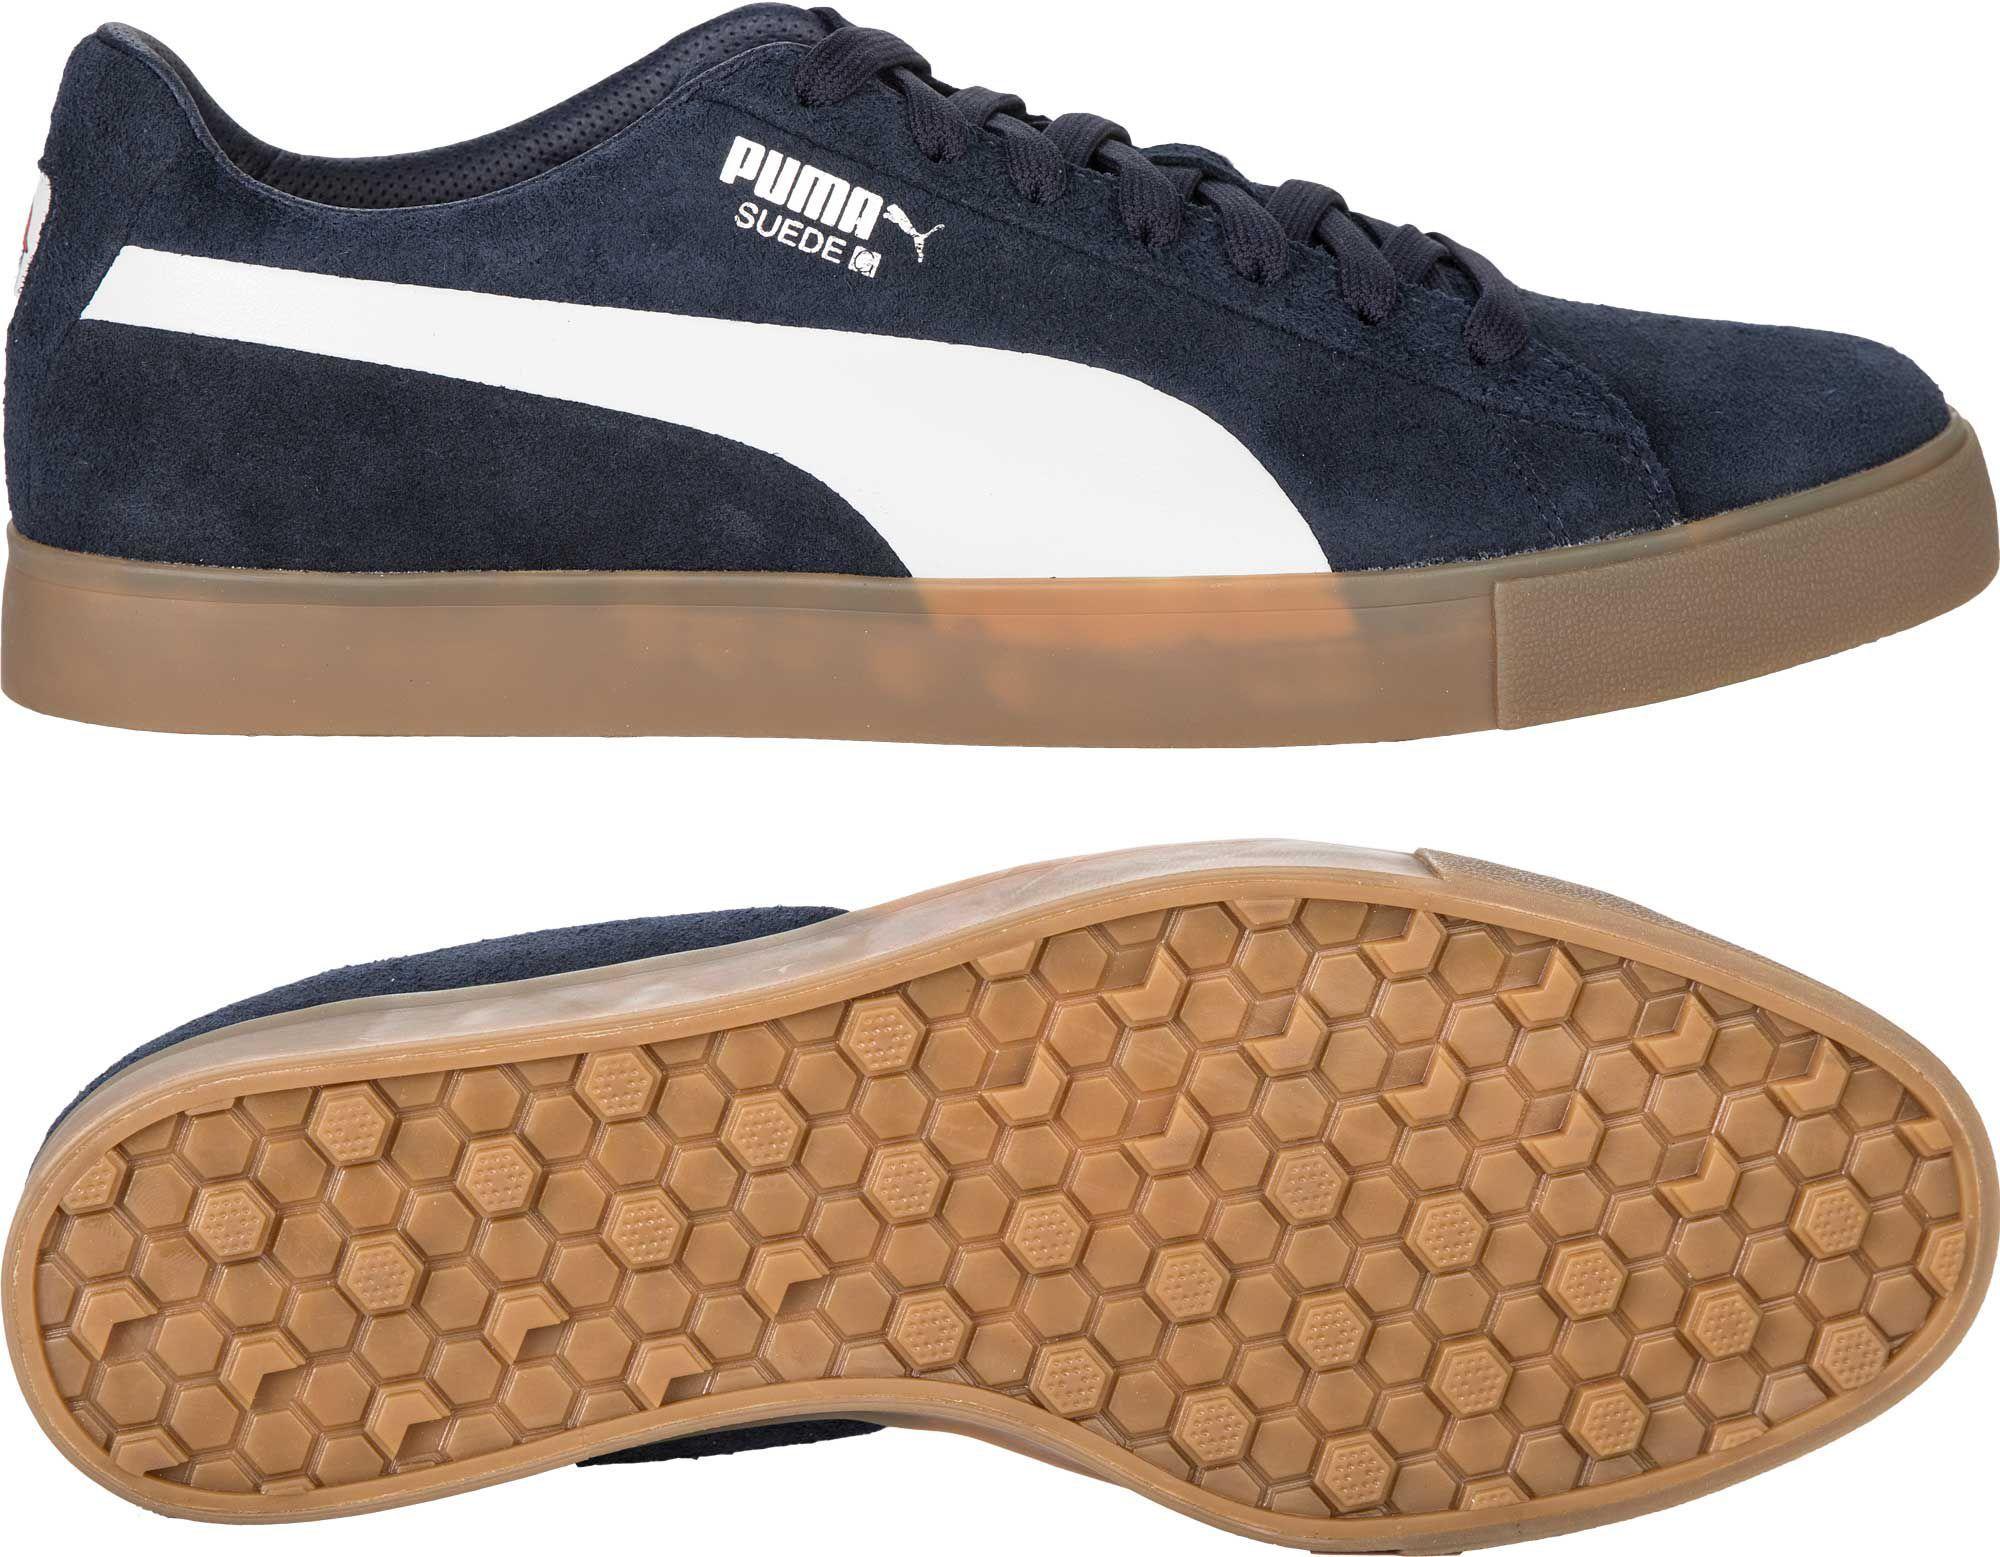 quality design ffba4 a1e6a PUMA Men's Suede G Malbon Golf Shoes | Products | Womens ...